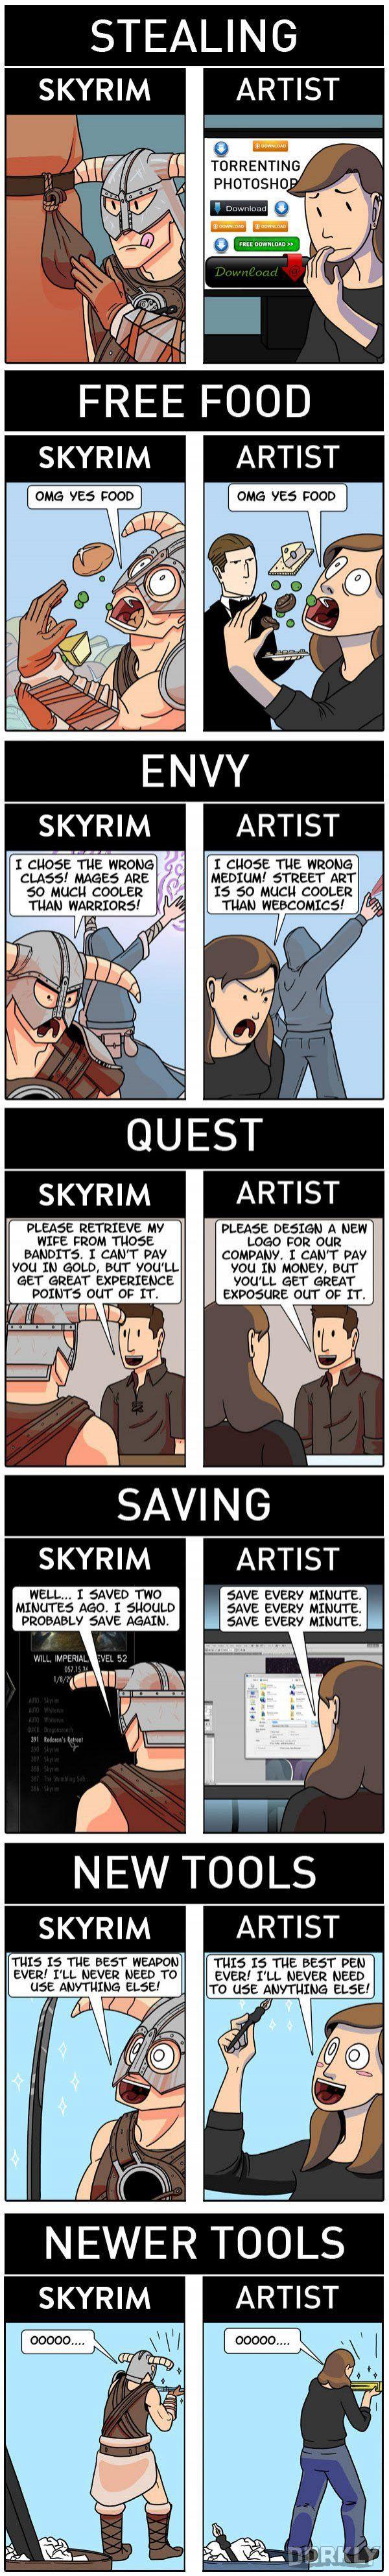 """How Skyrim Perfectly Describes the Life of an Artist"" #dorkly #geek #skyrim"